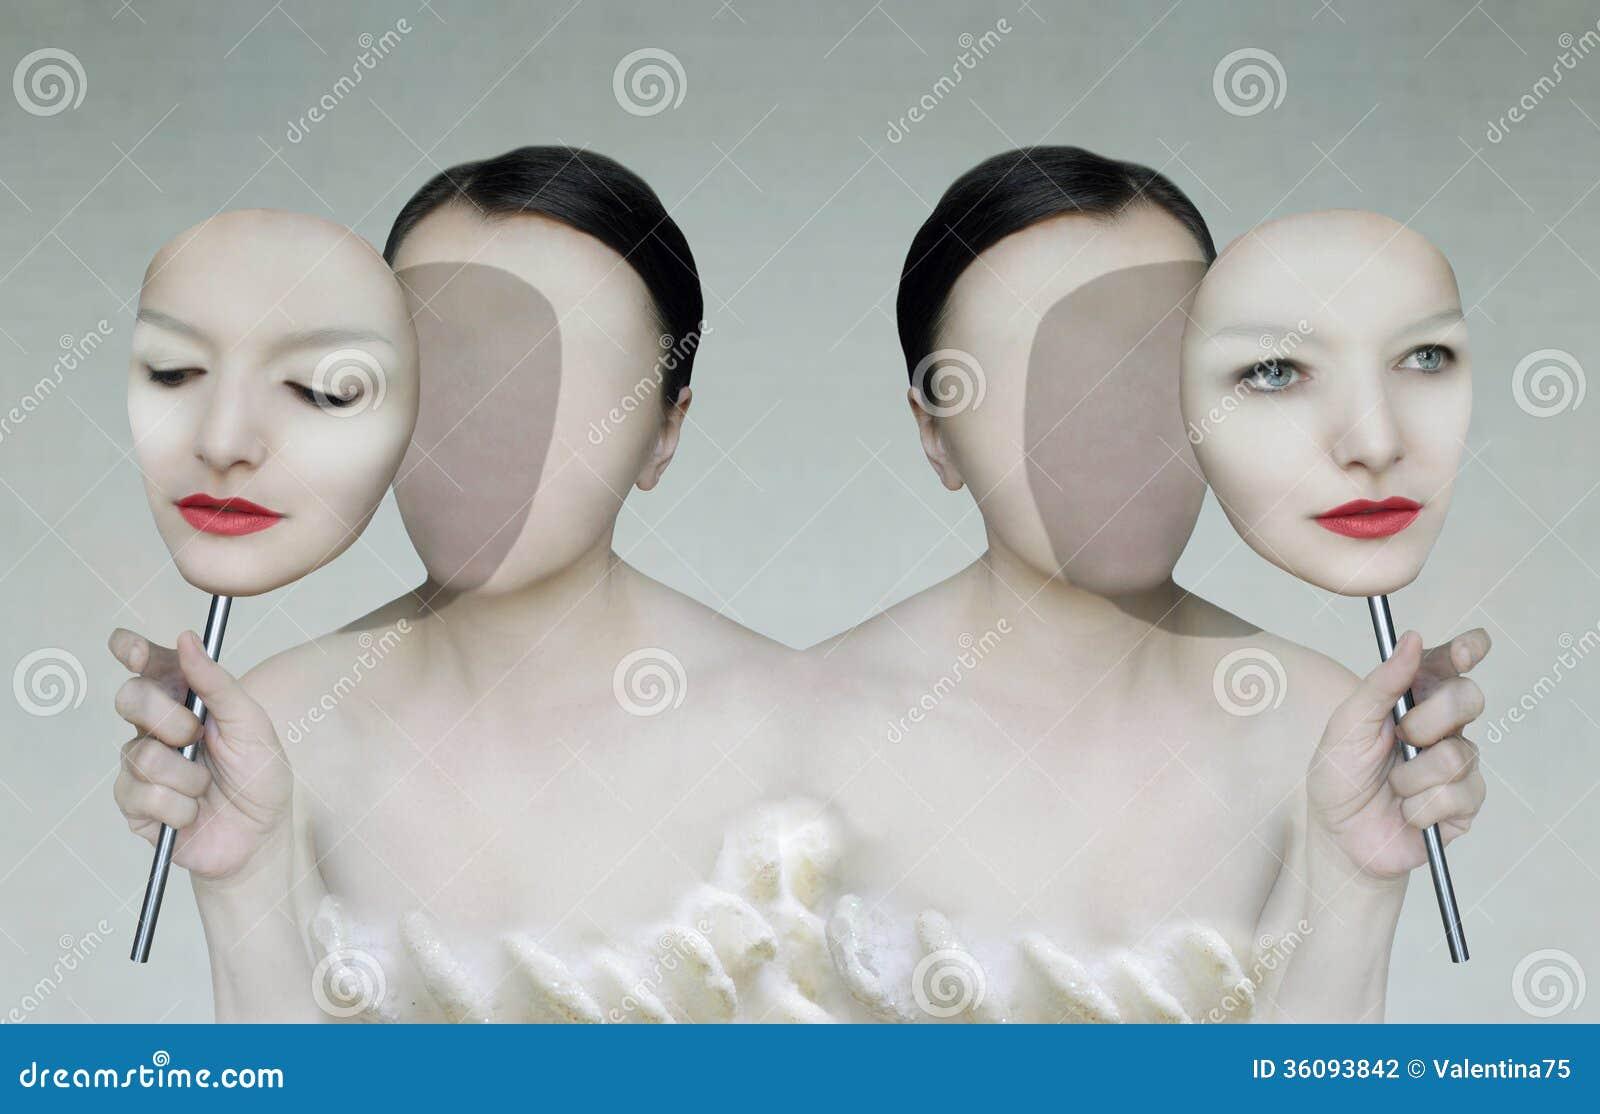 Retrato surrealista